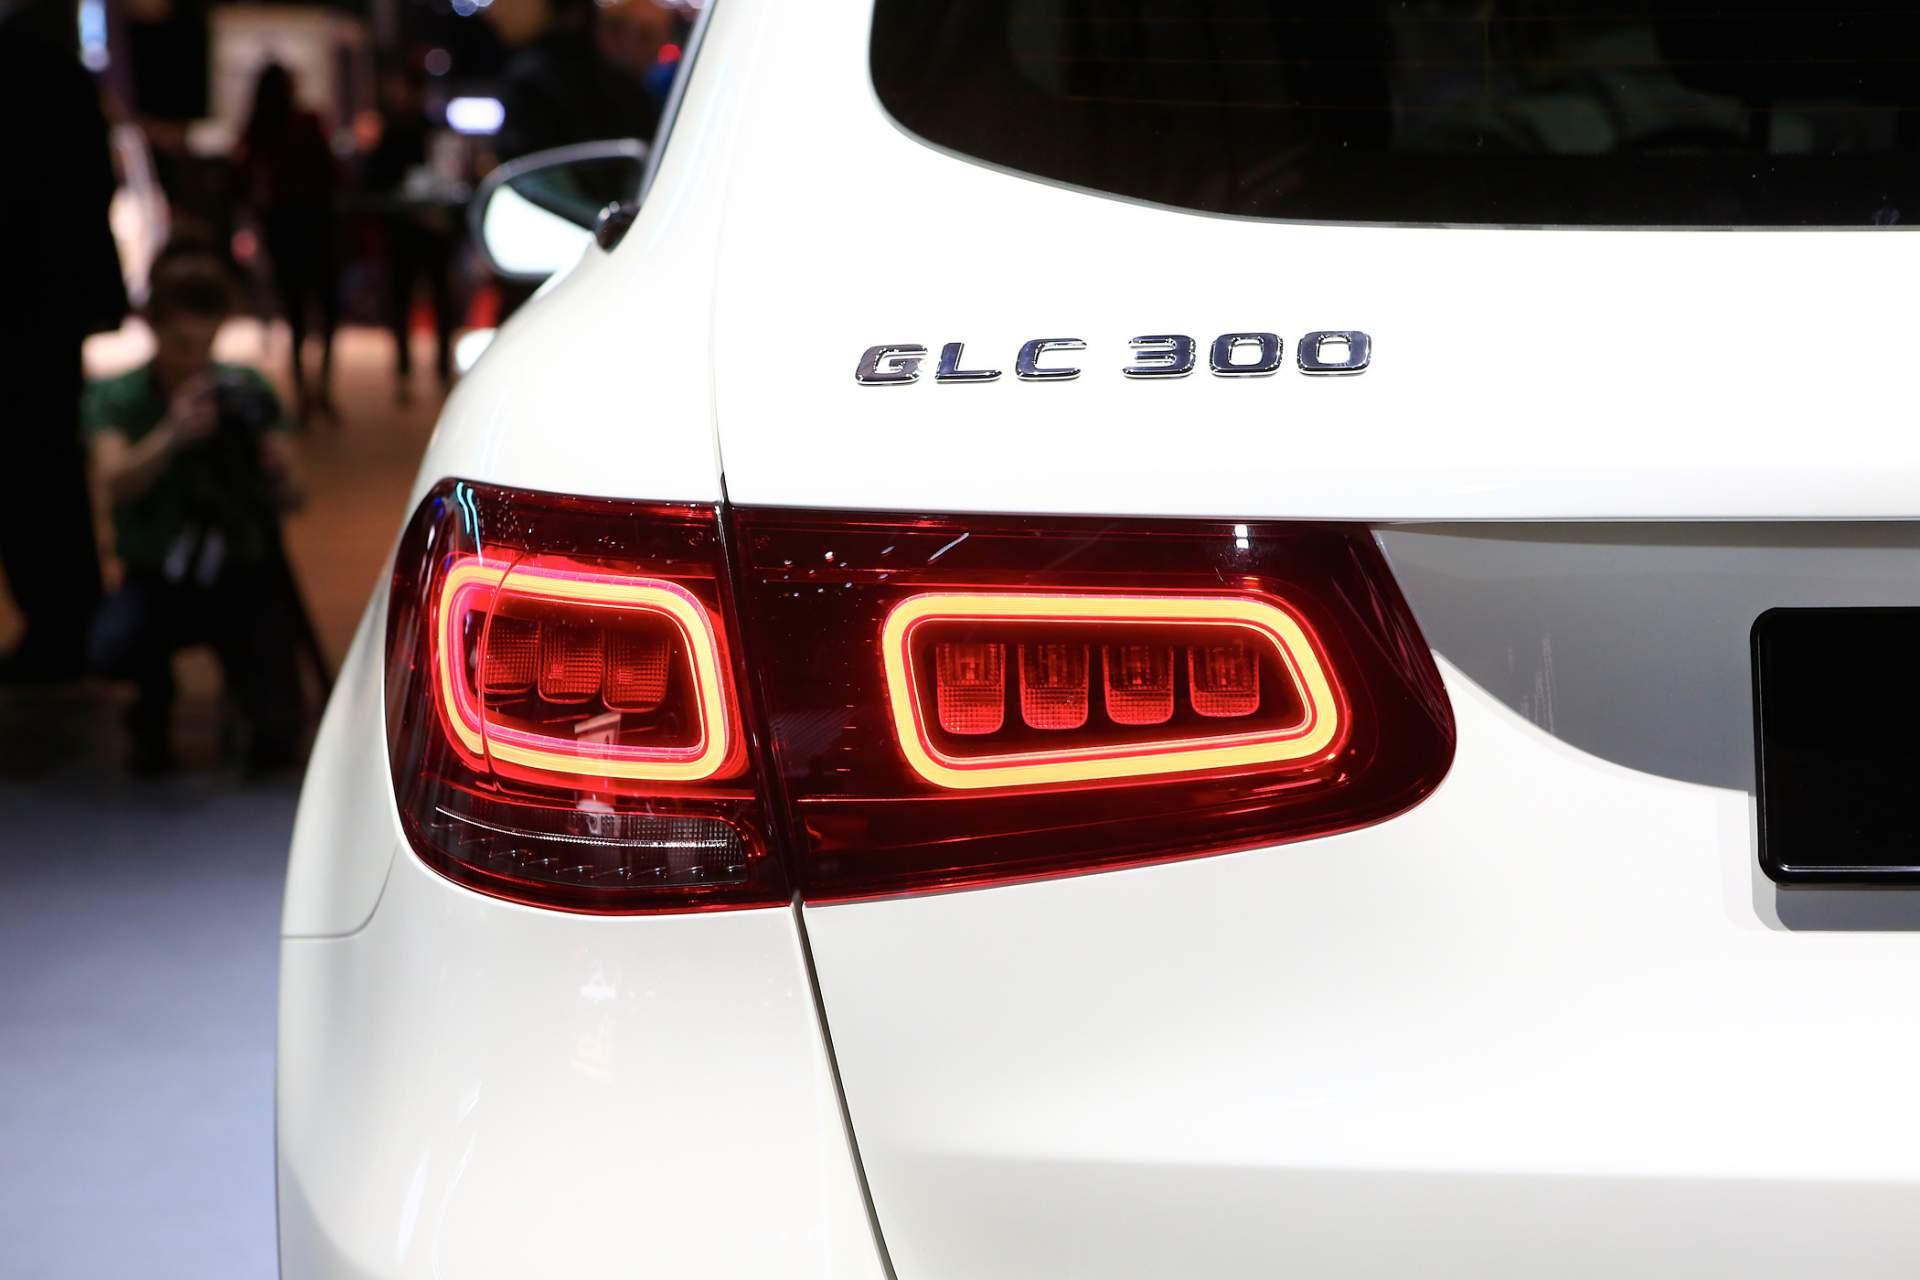 mercedes-benz-glc-2020e5ce1281-mercedes-benz-glc-facelift-at-2019-geneva-motor-show-10.jpg